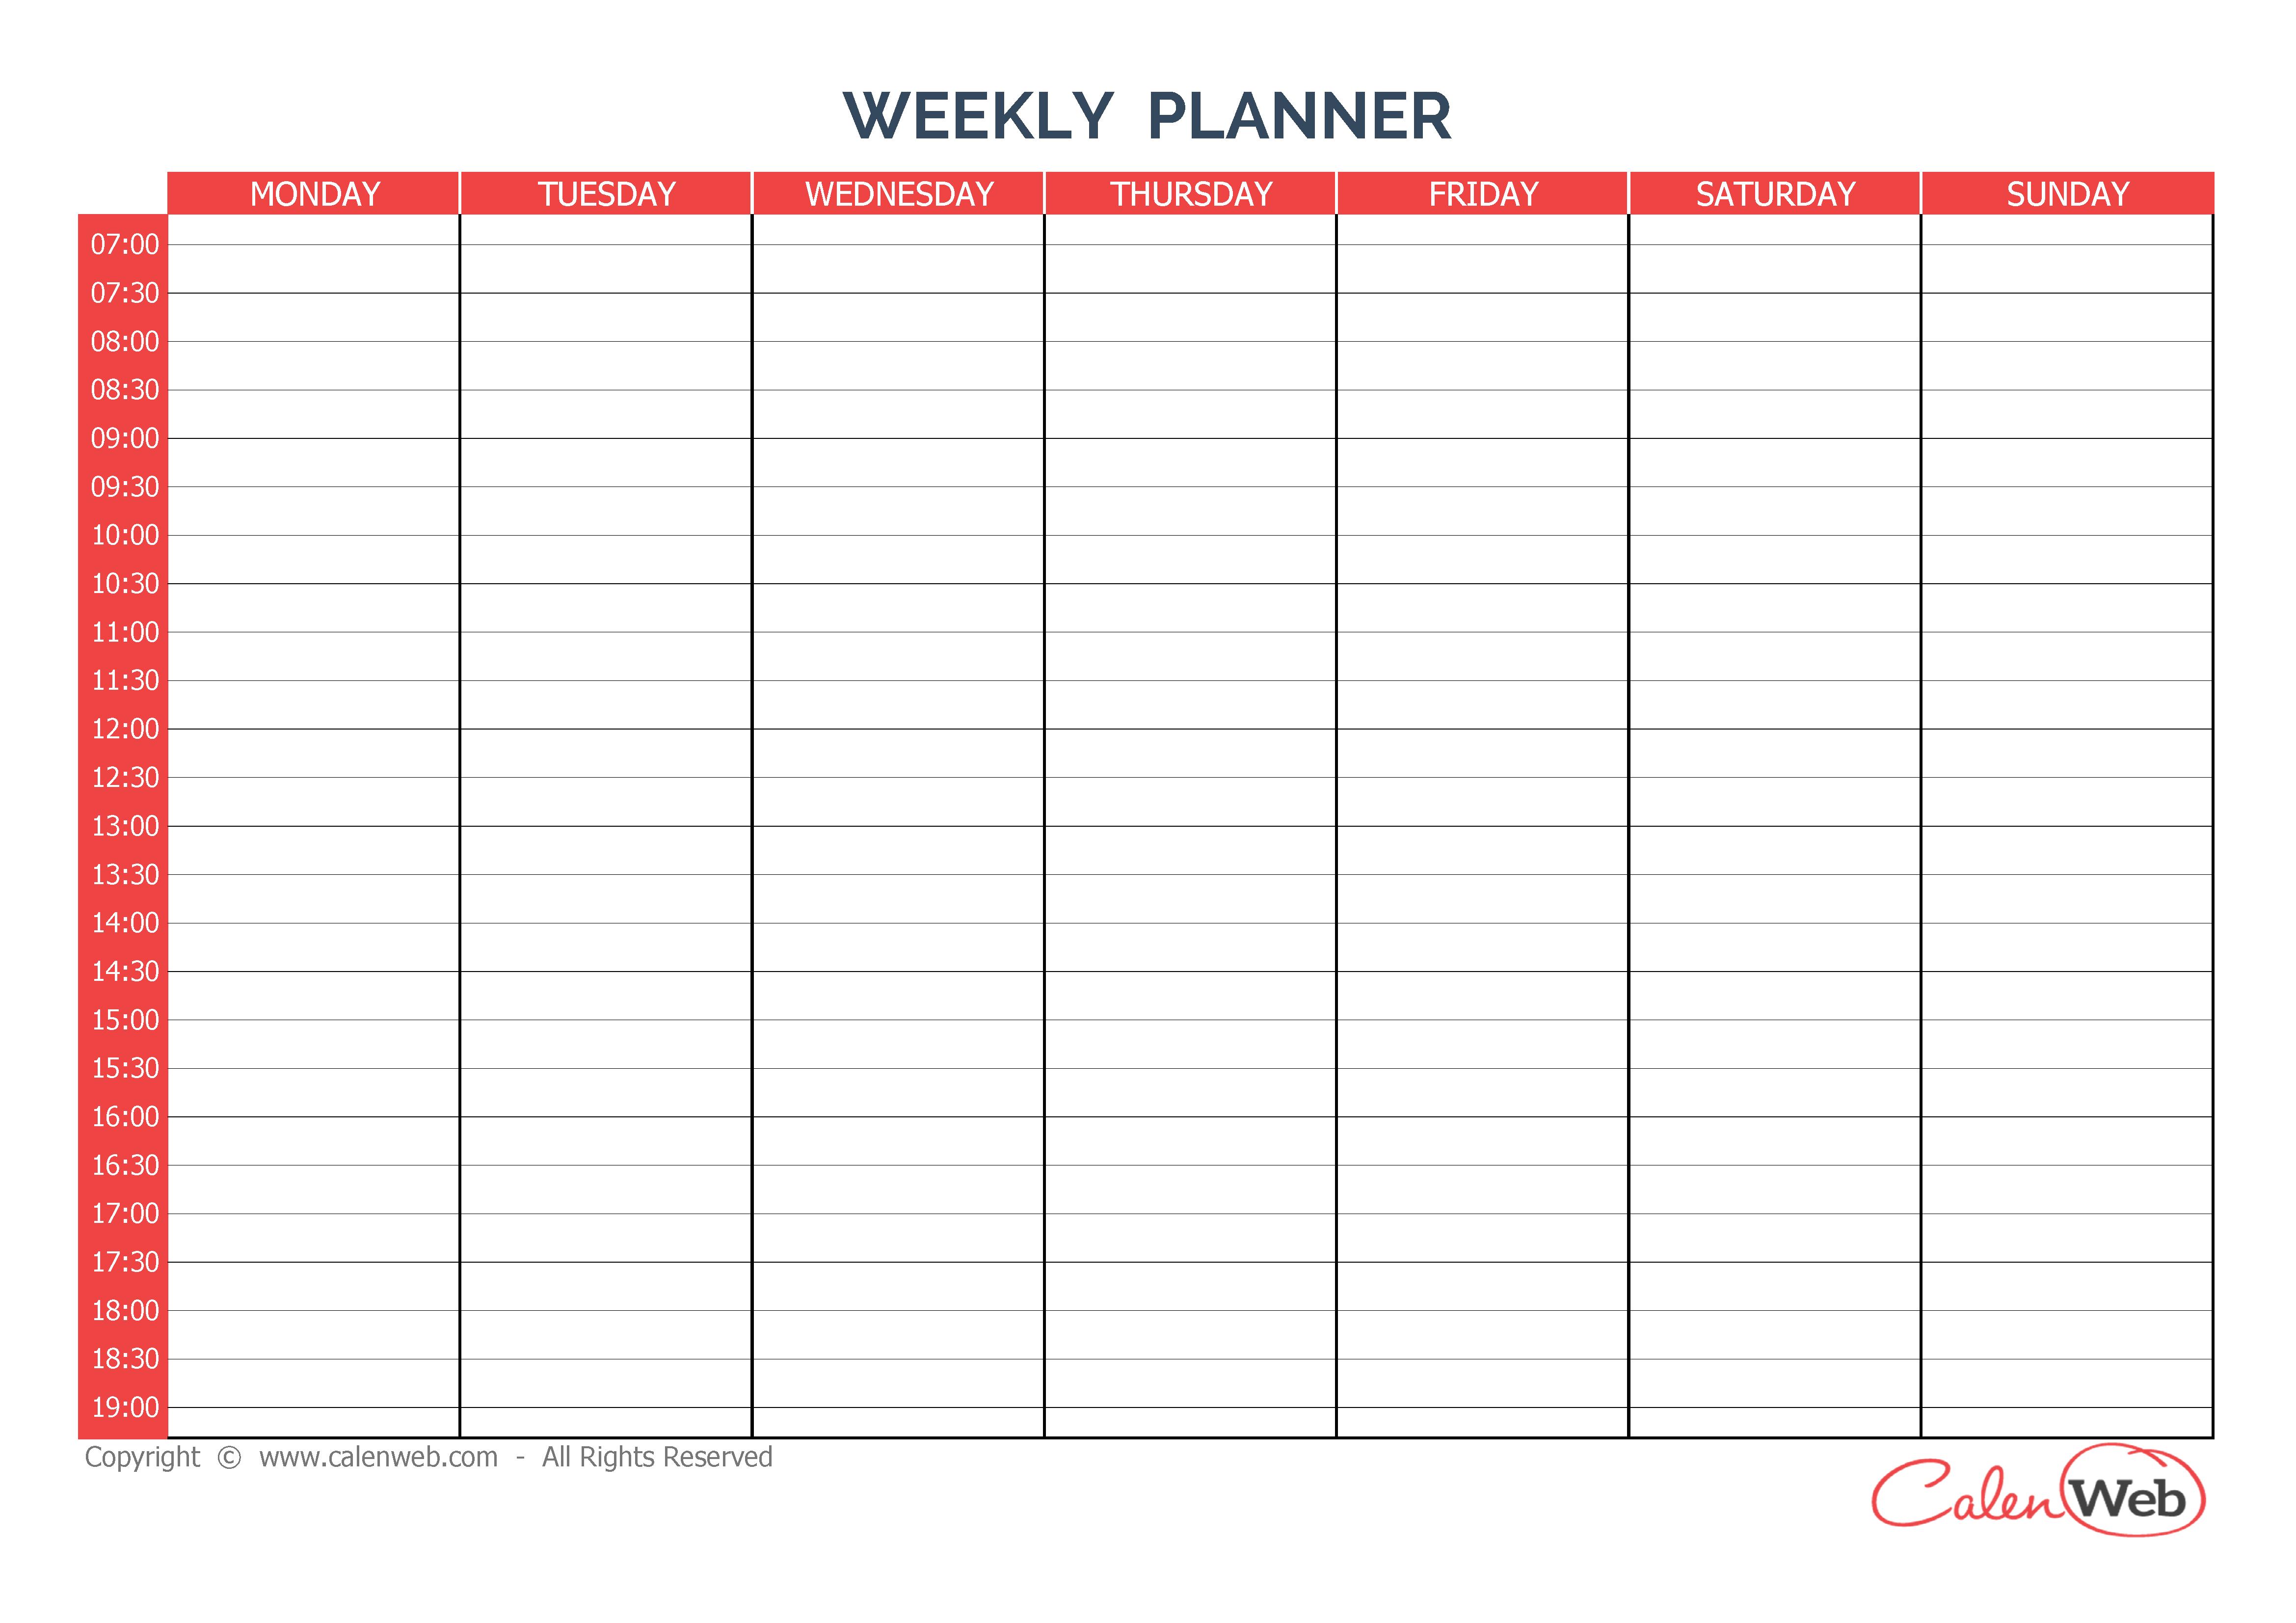 Day Calendar Printable - 7-Day Calendar Template, 5 Day Week Blank ...